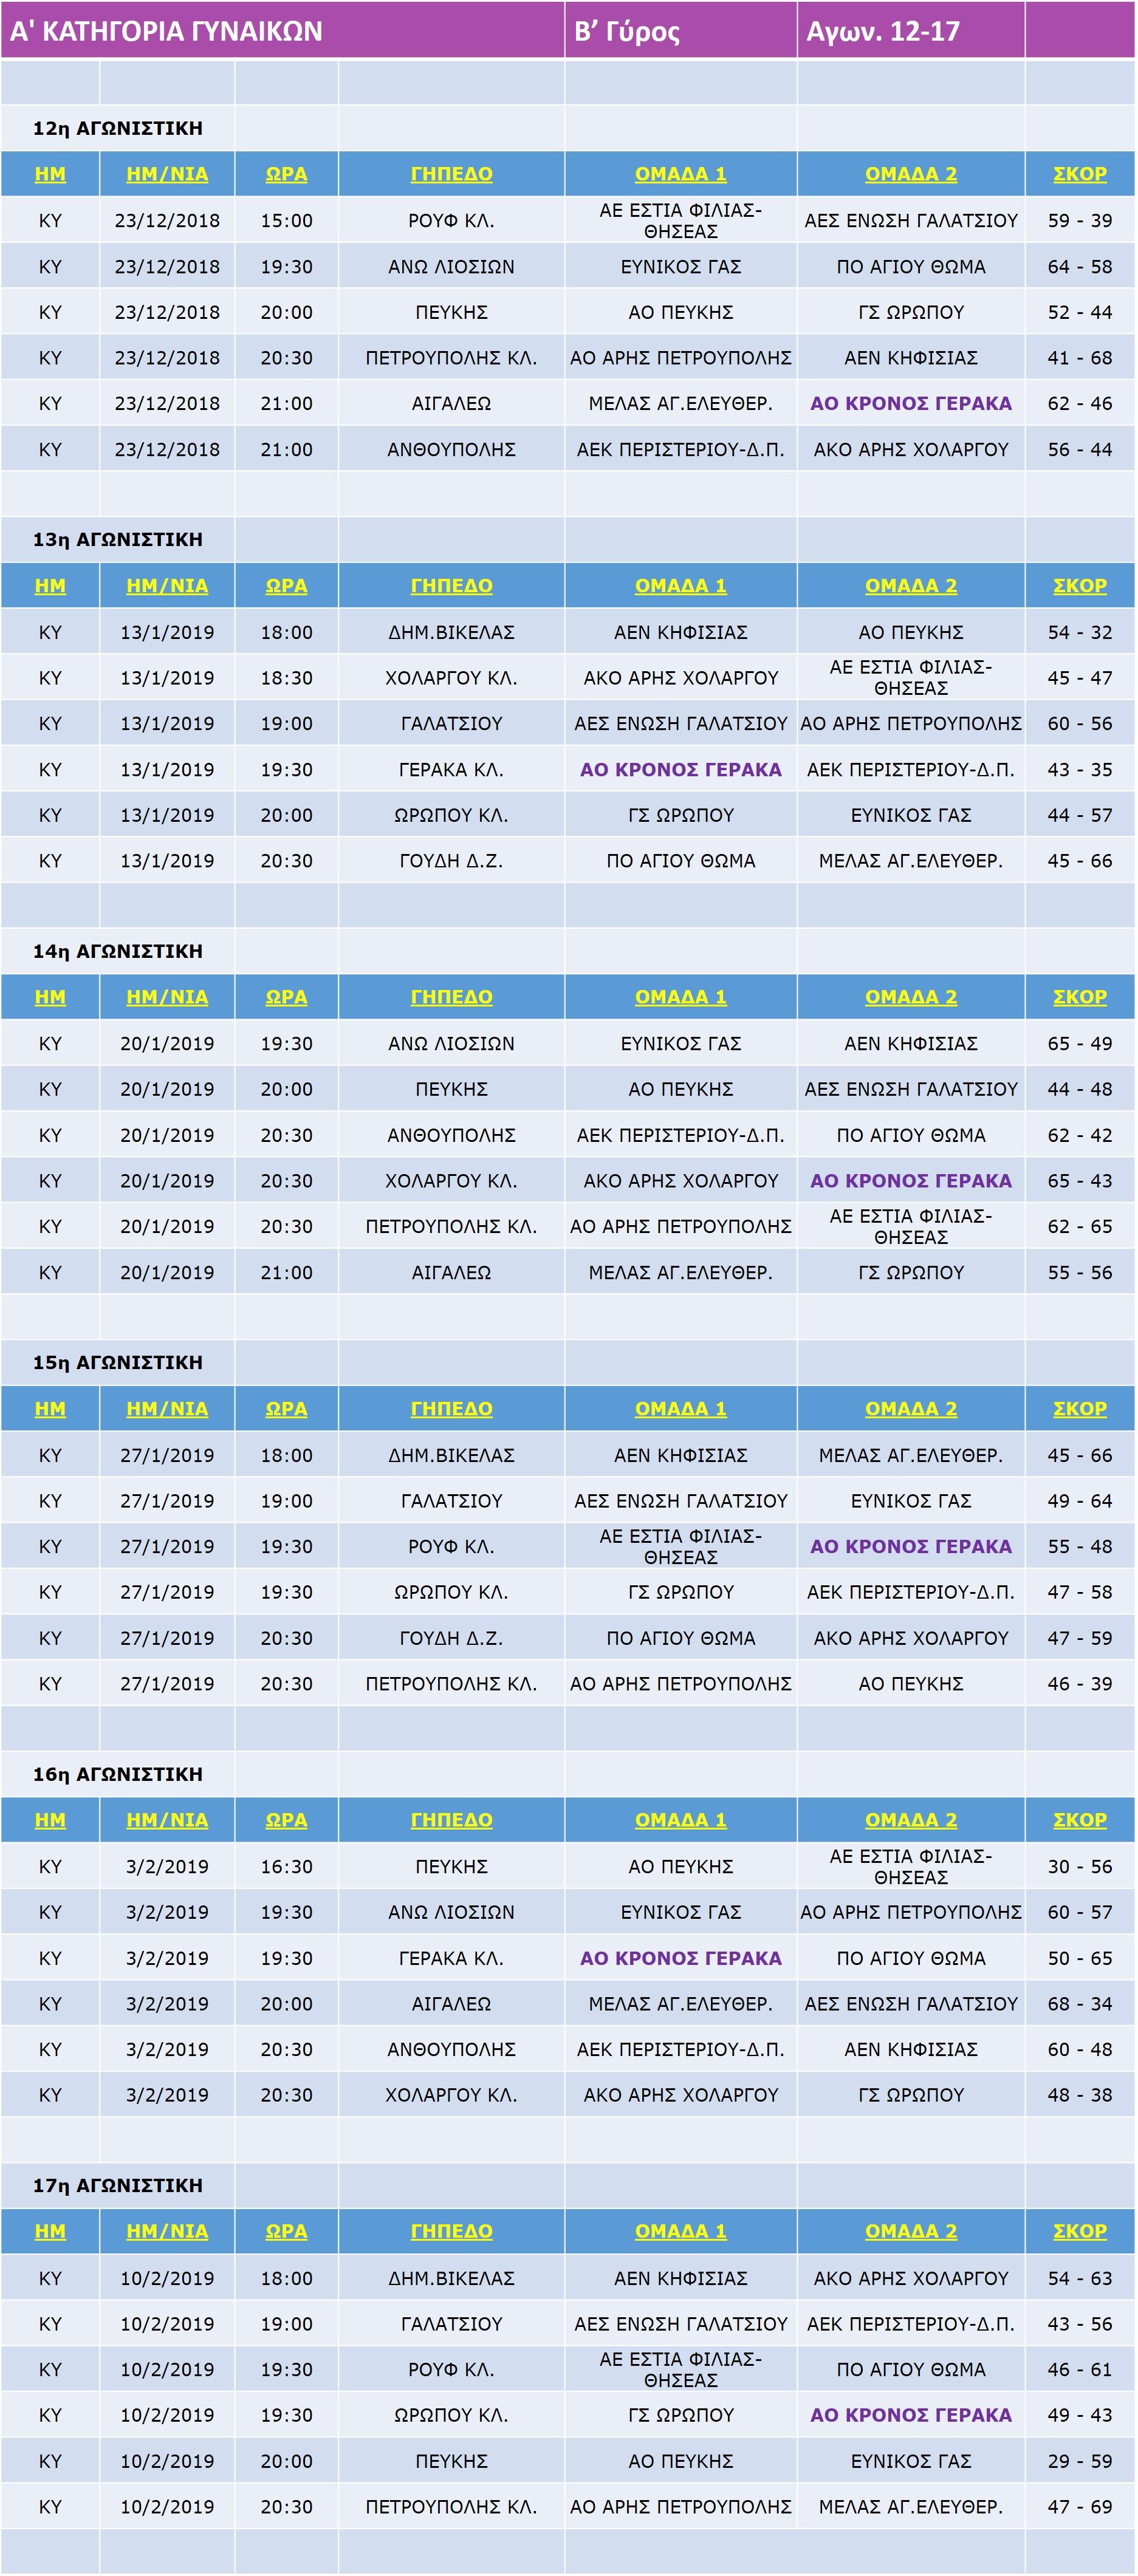 Gynaikes_Match_12-17-17